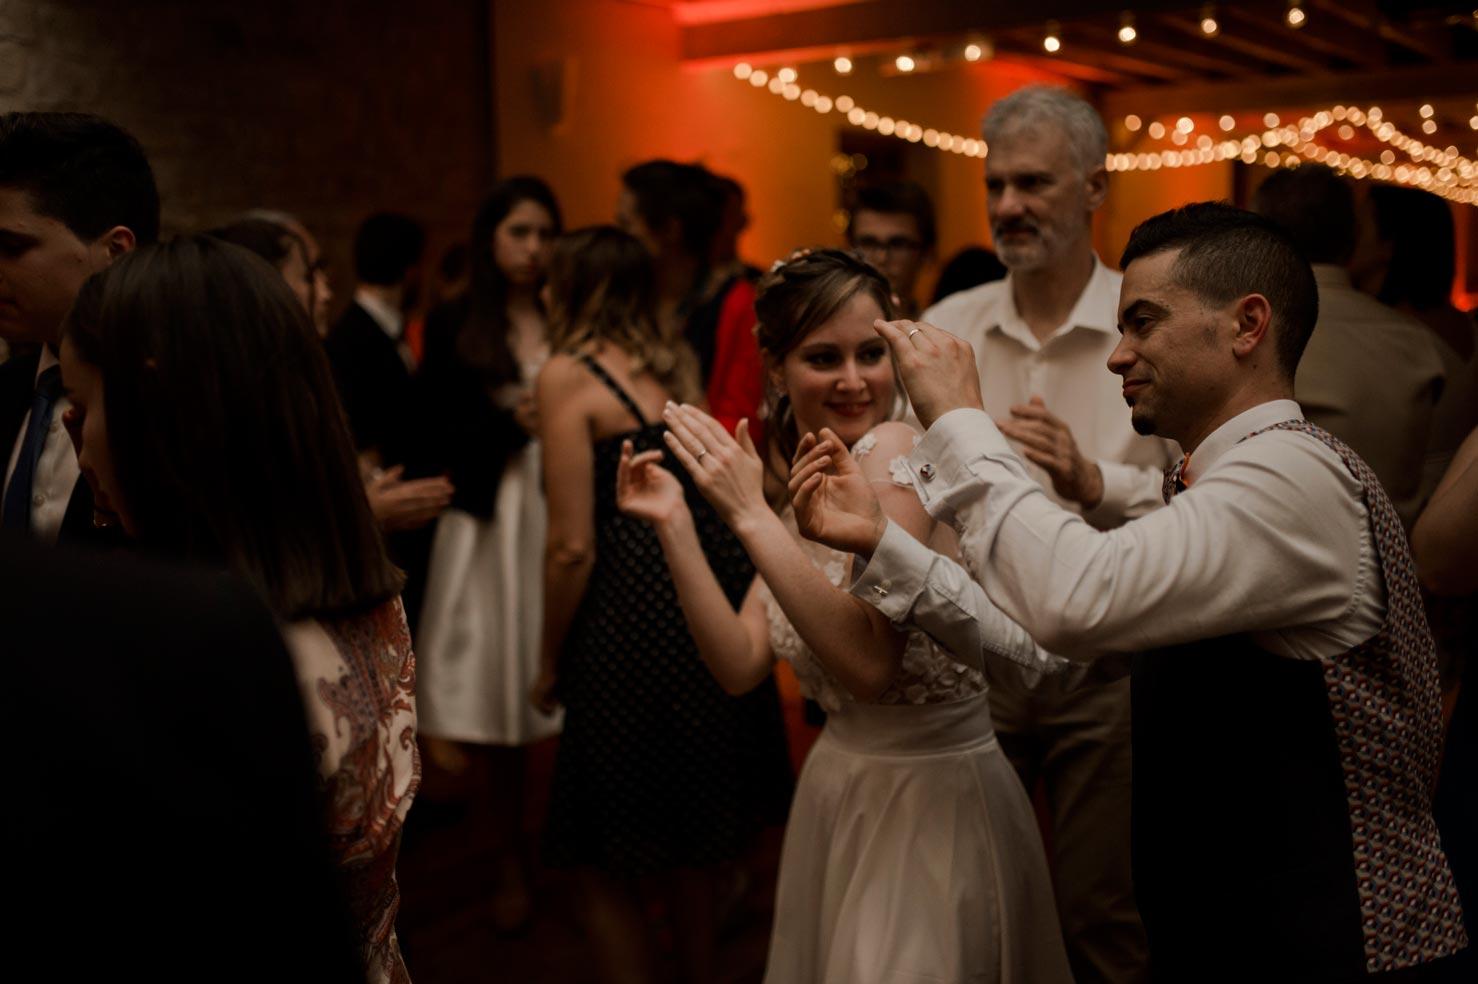 Dance floor mariage soirée